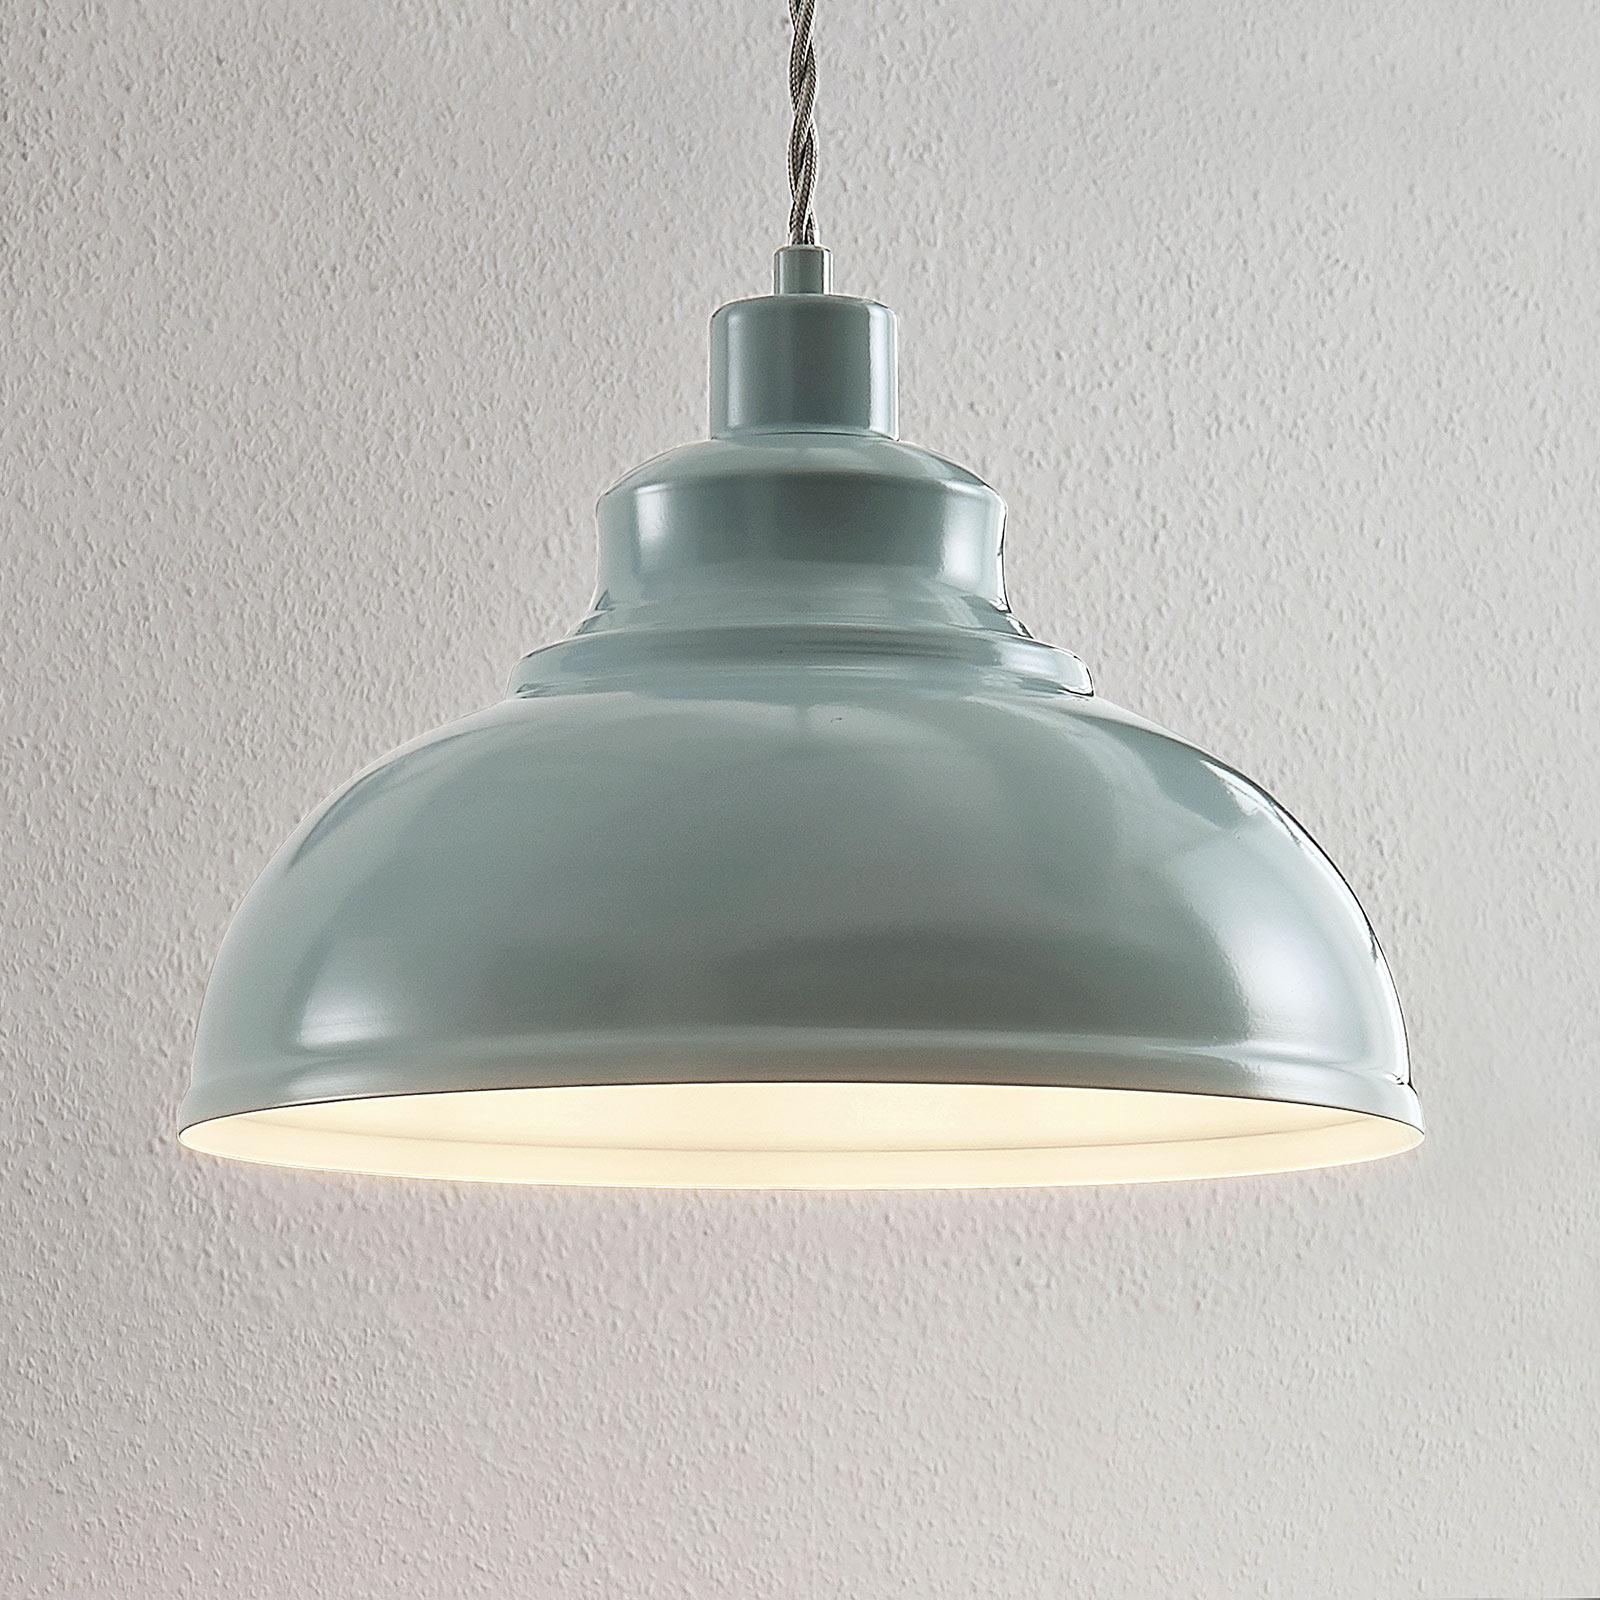 Vintage pendellampe Albertine, metal, lyseblå